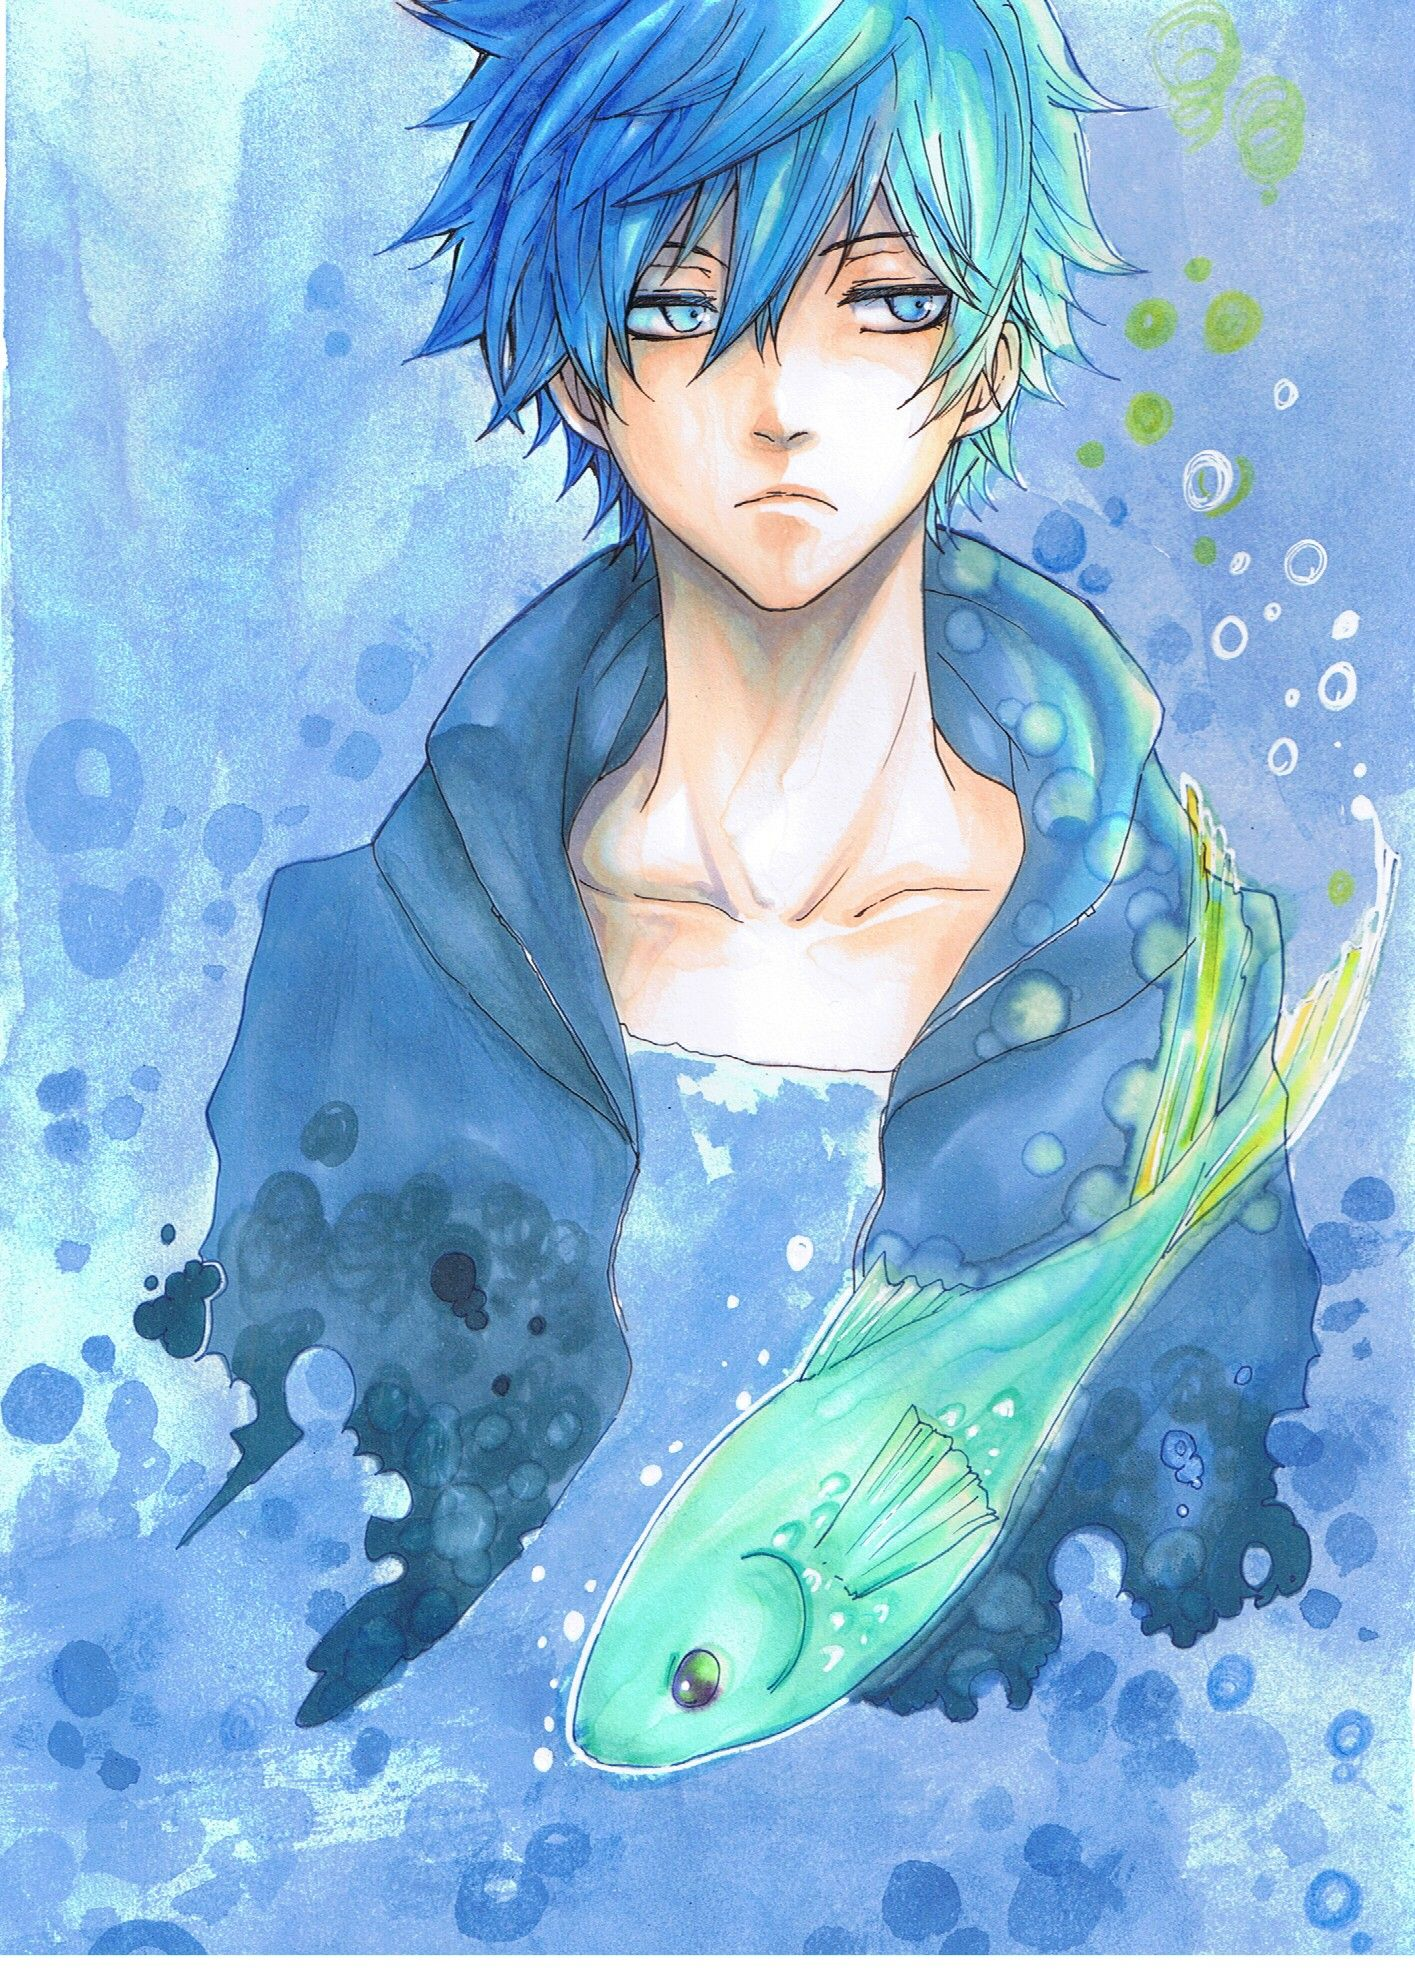 Karneval gareki beneath the sea fanart anime guy blue hair anime hair